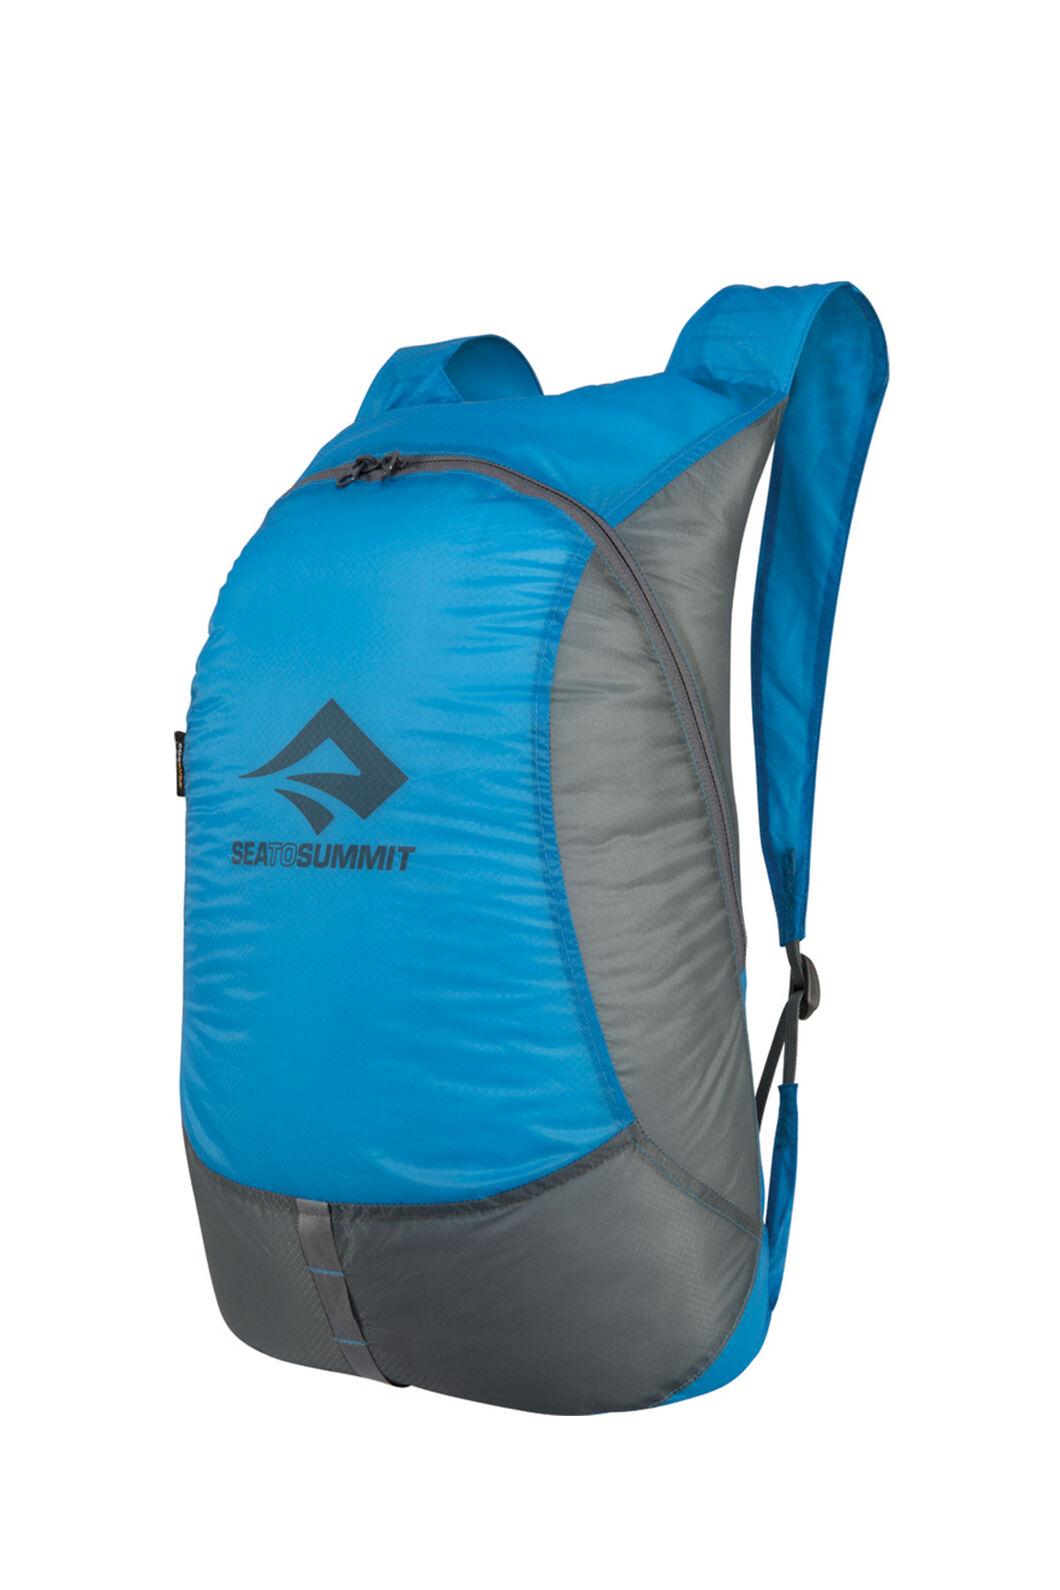 Sea to Summit Ultra-Sil Daypack 20L, Blue, hi-res